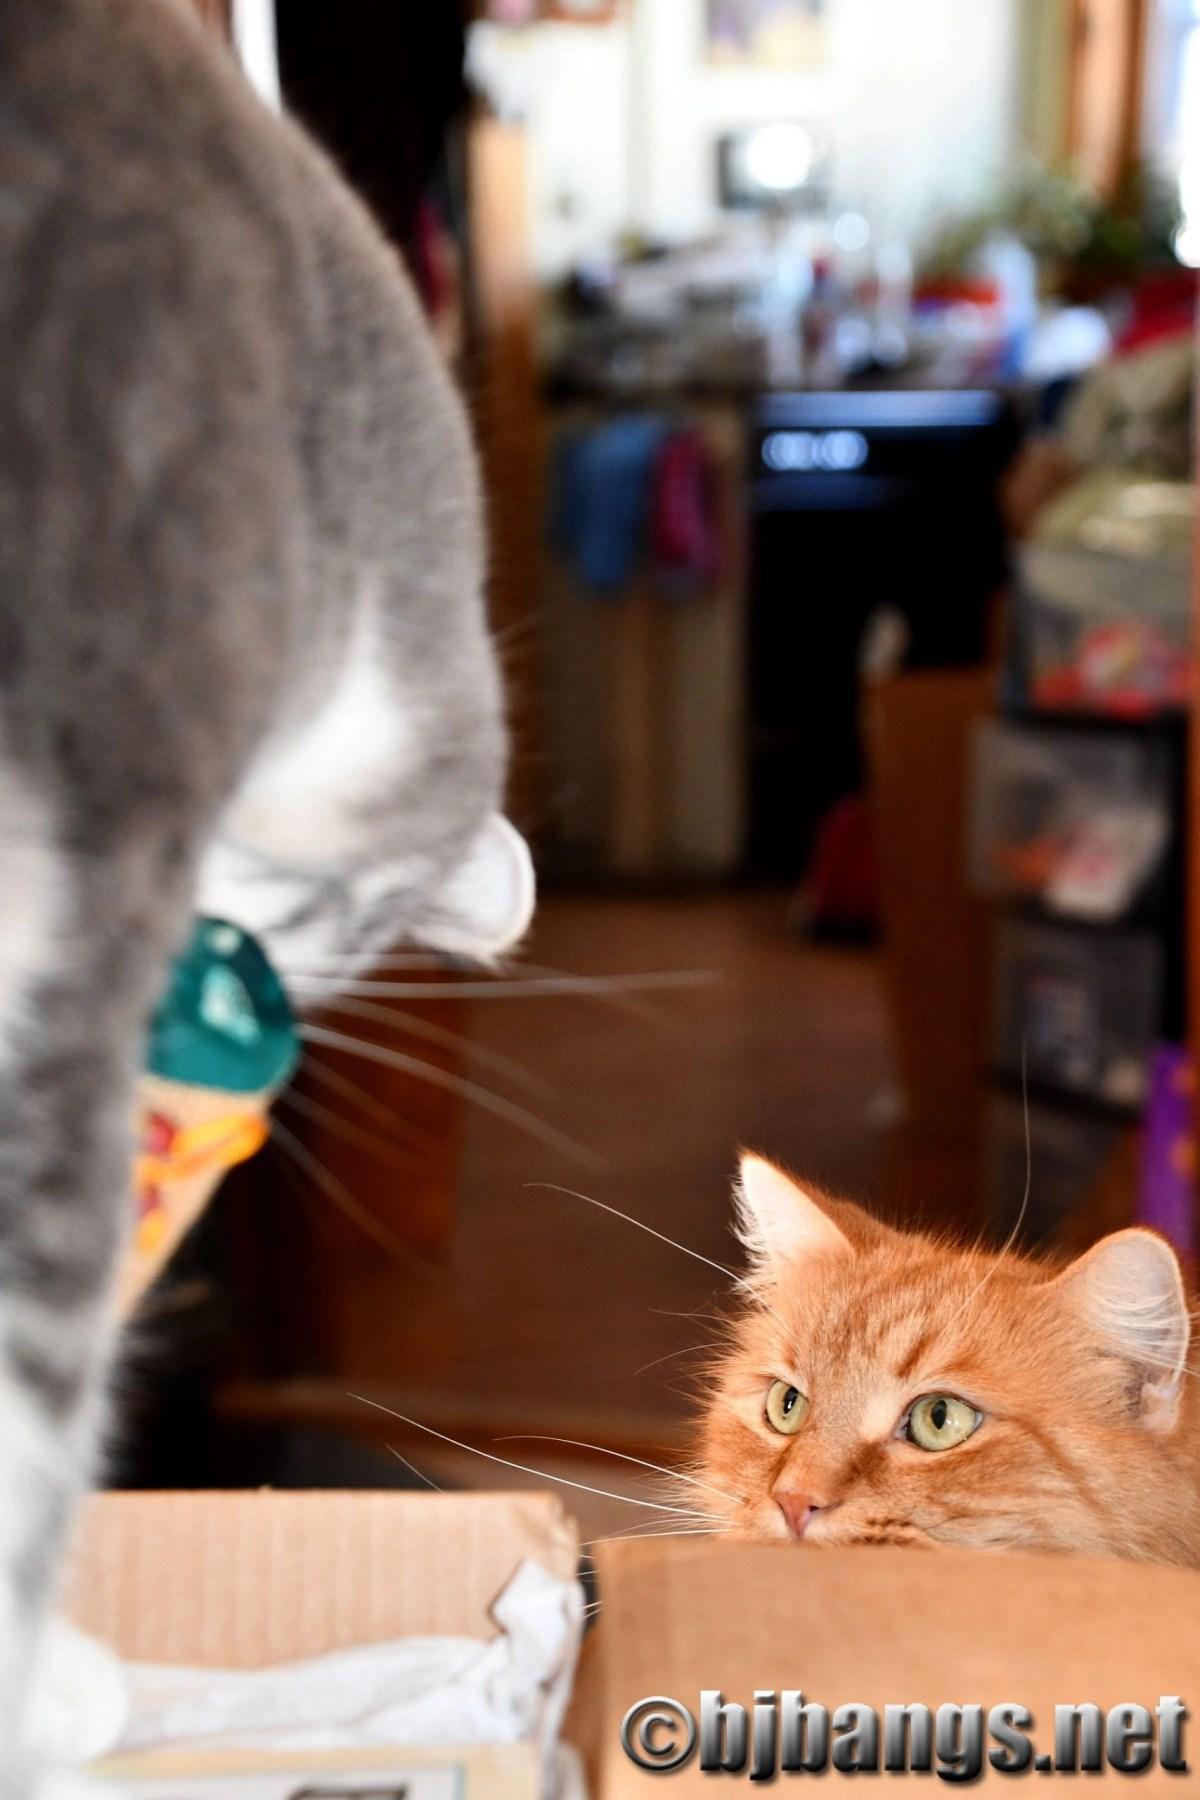 Secret Paws brings cats holiday joy